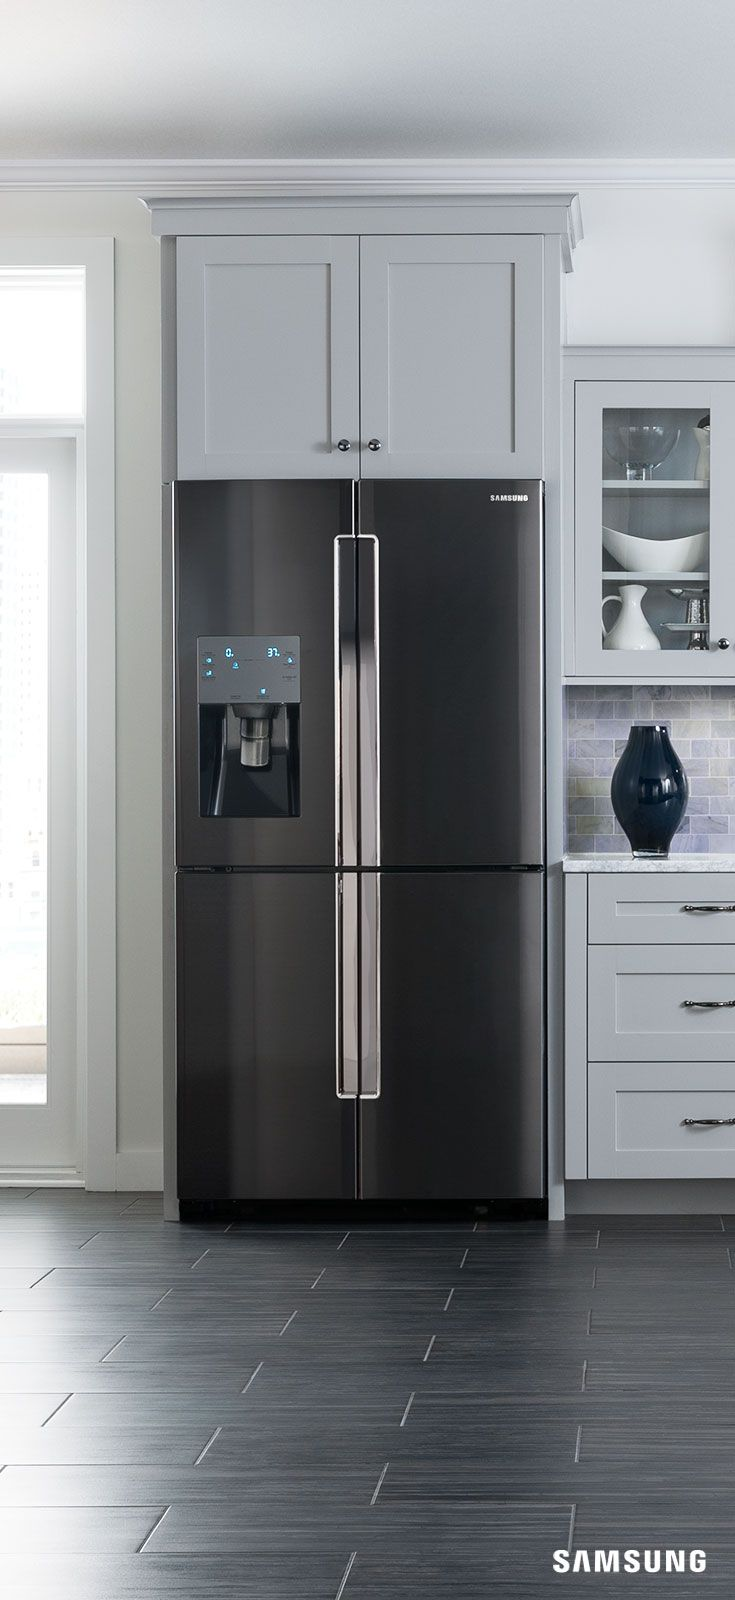 23 Cu Ft Counter Depth 4 Door Flex Refrigerator With Flexzone